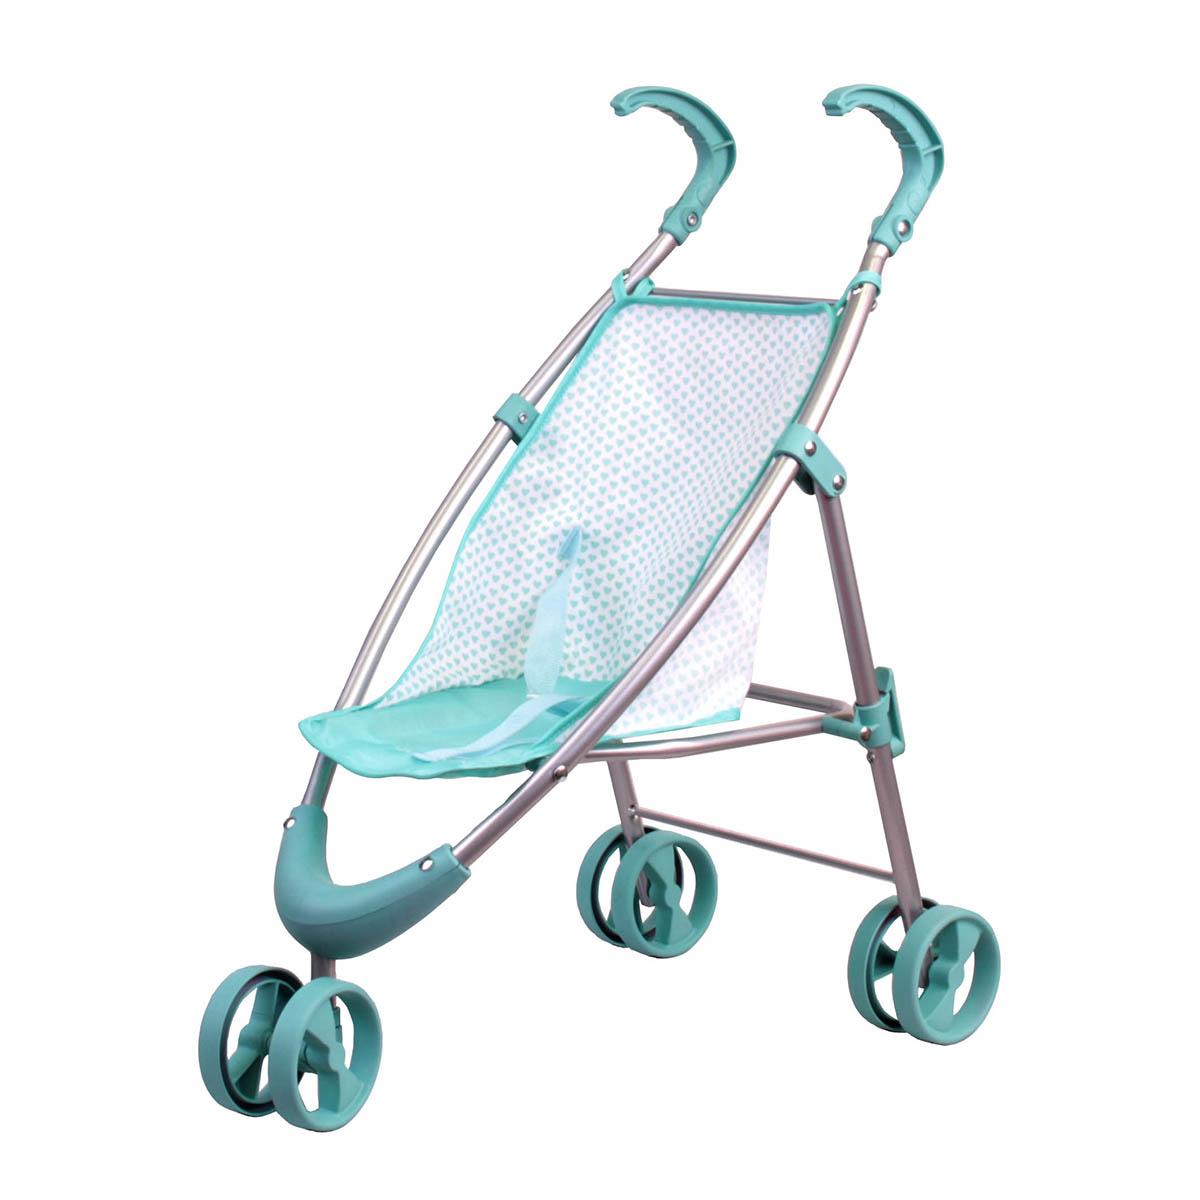 Прогулочная коляска мятная - Коляски для кукол, артикул: 159025